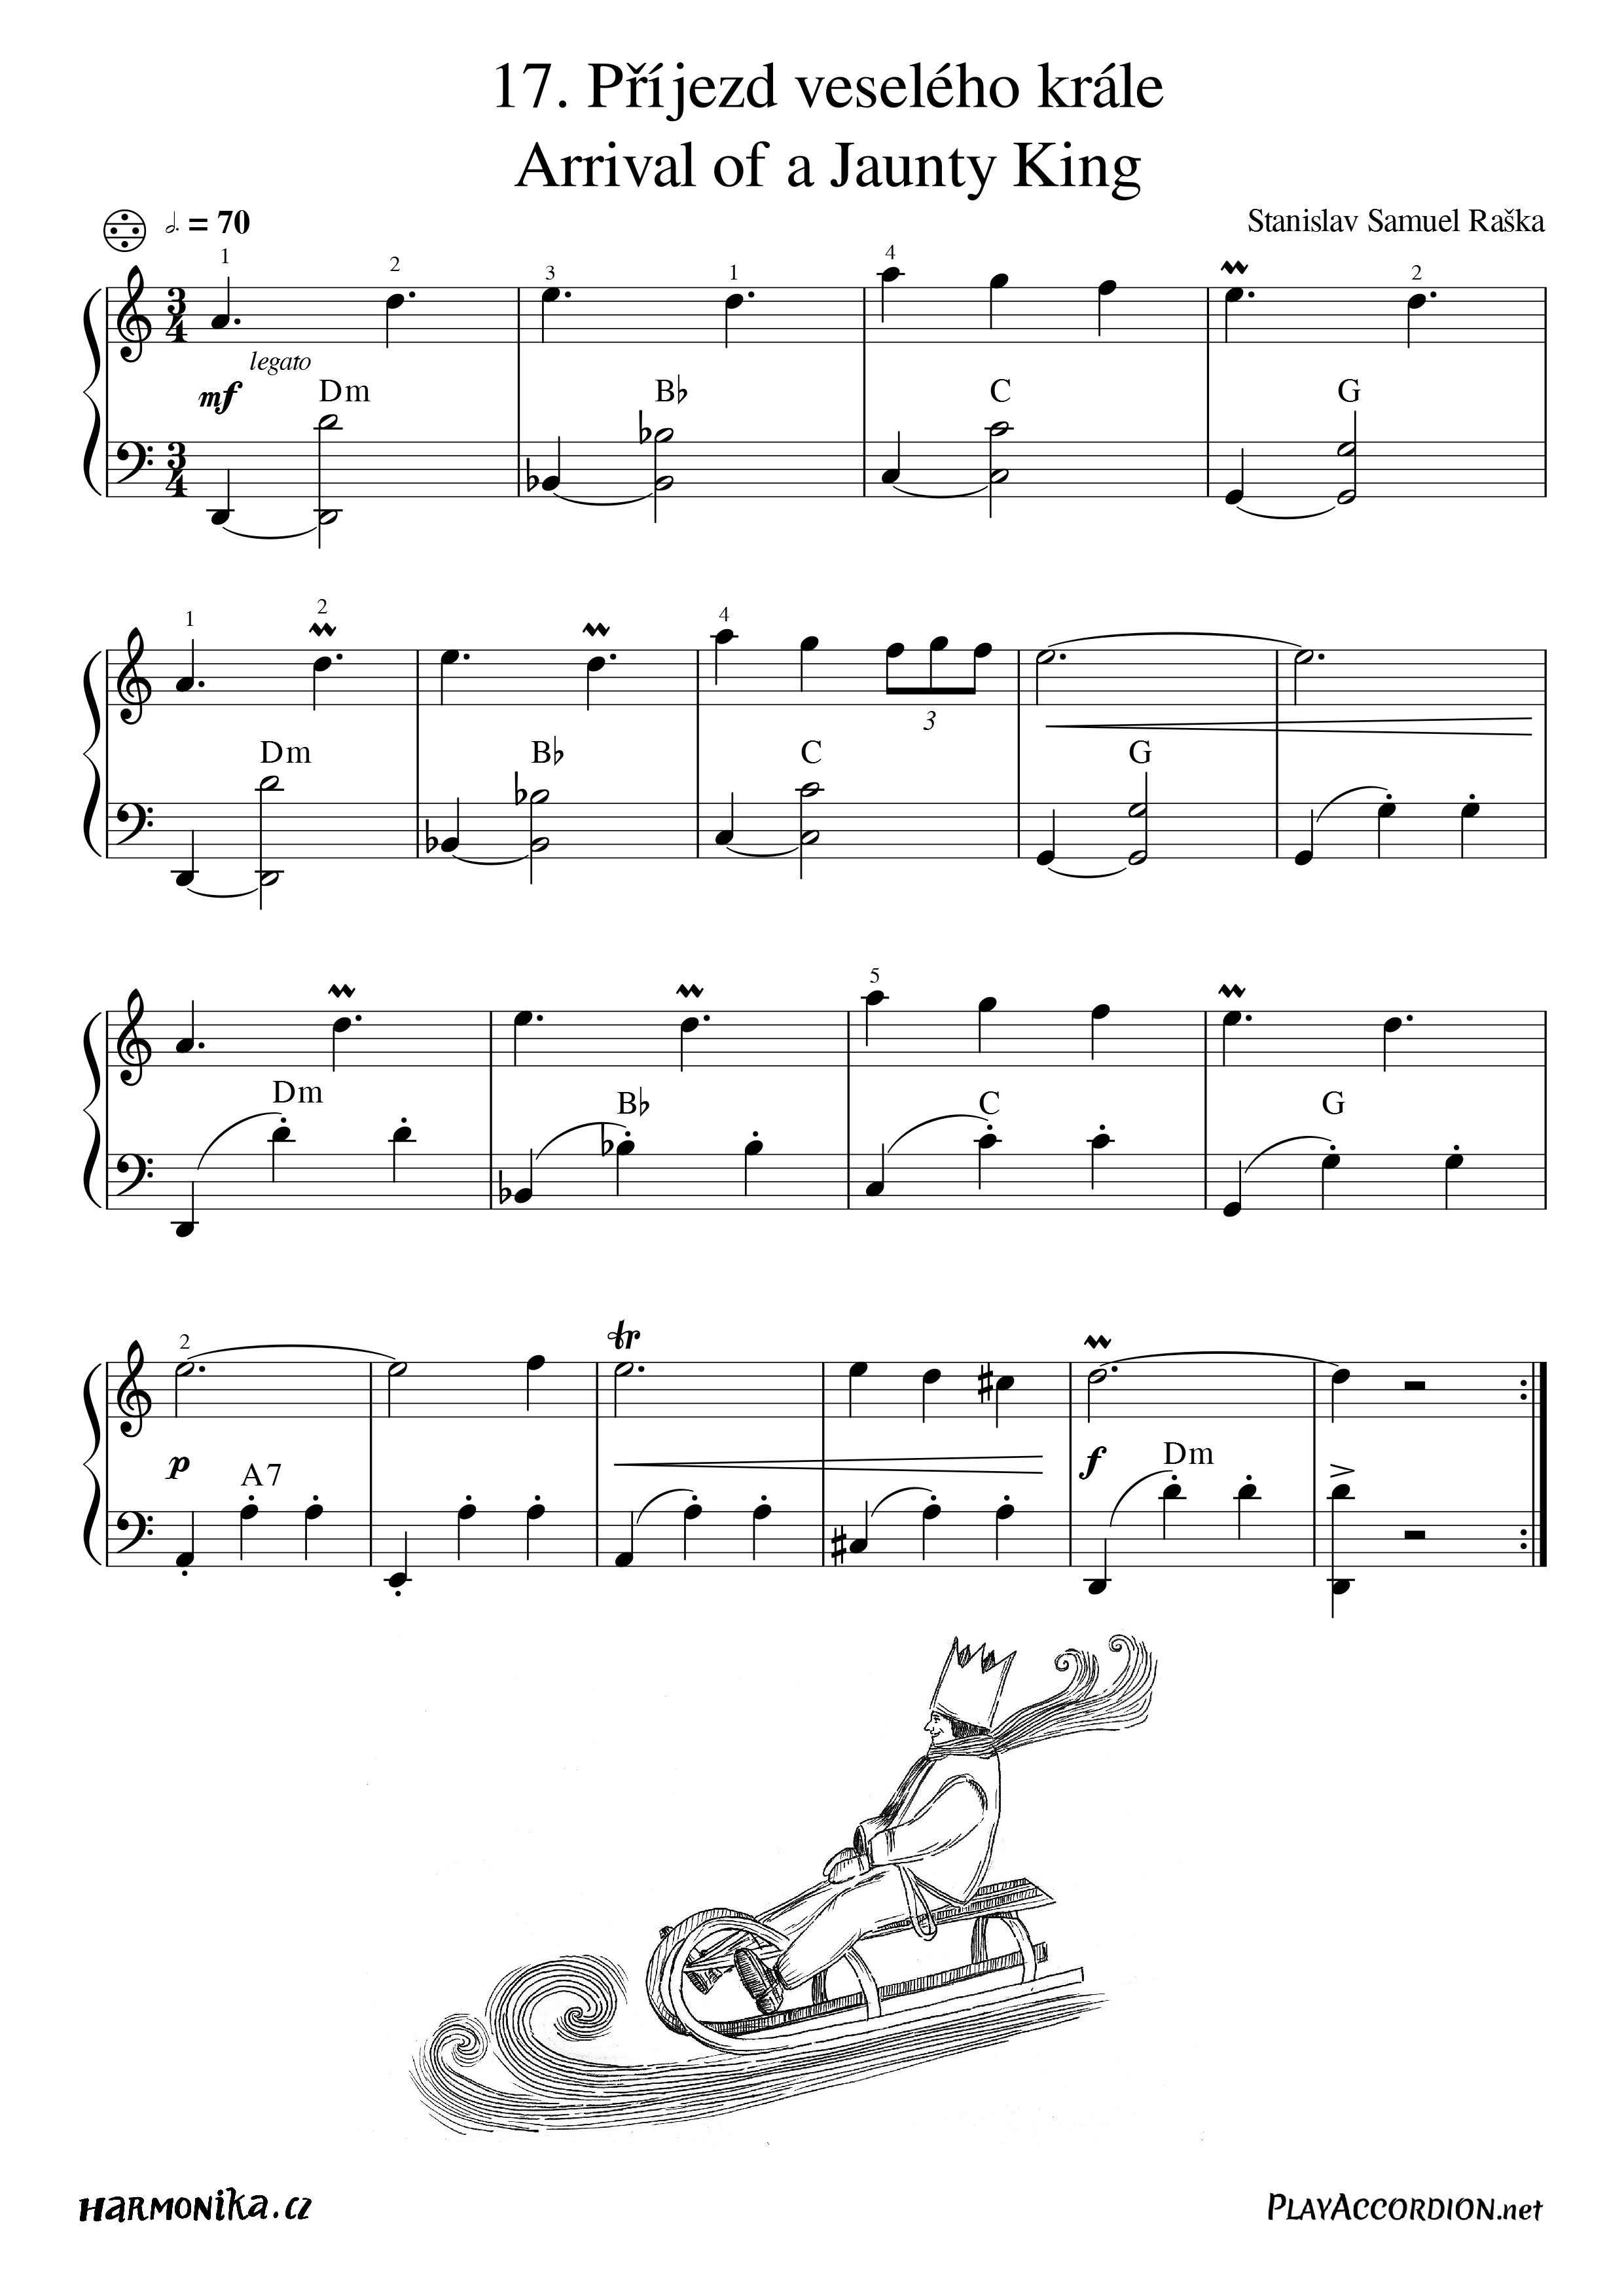 17_prijezd-veseleho-krale-1